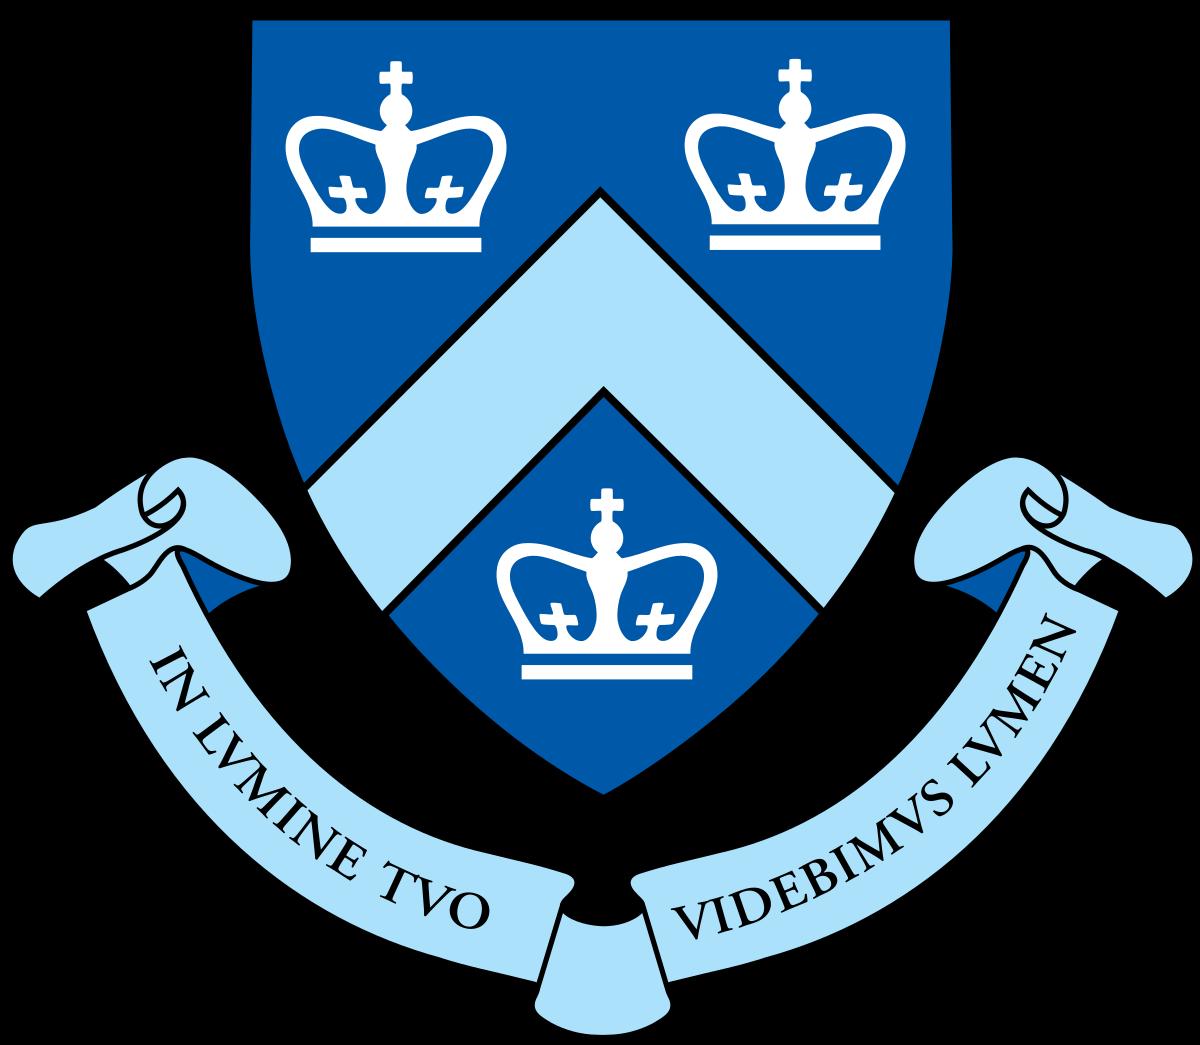 Columbia University Shield